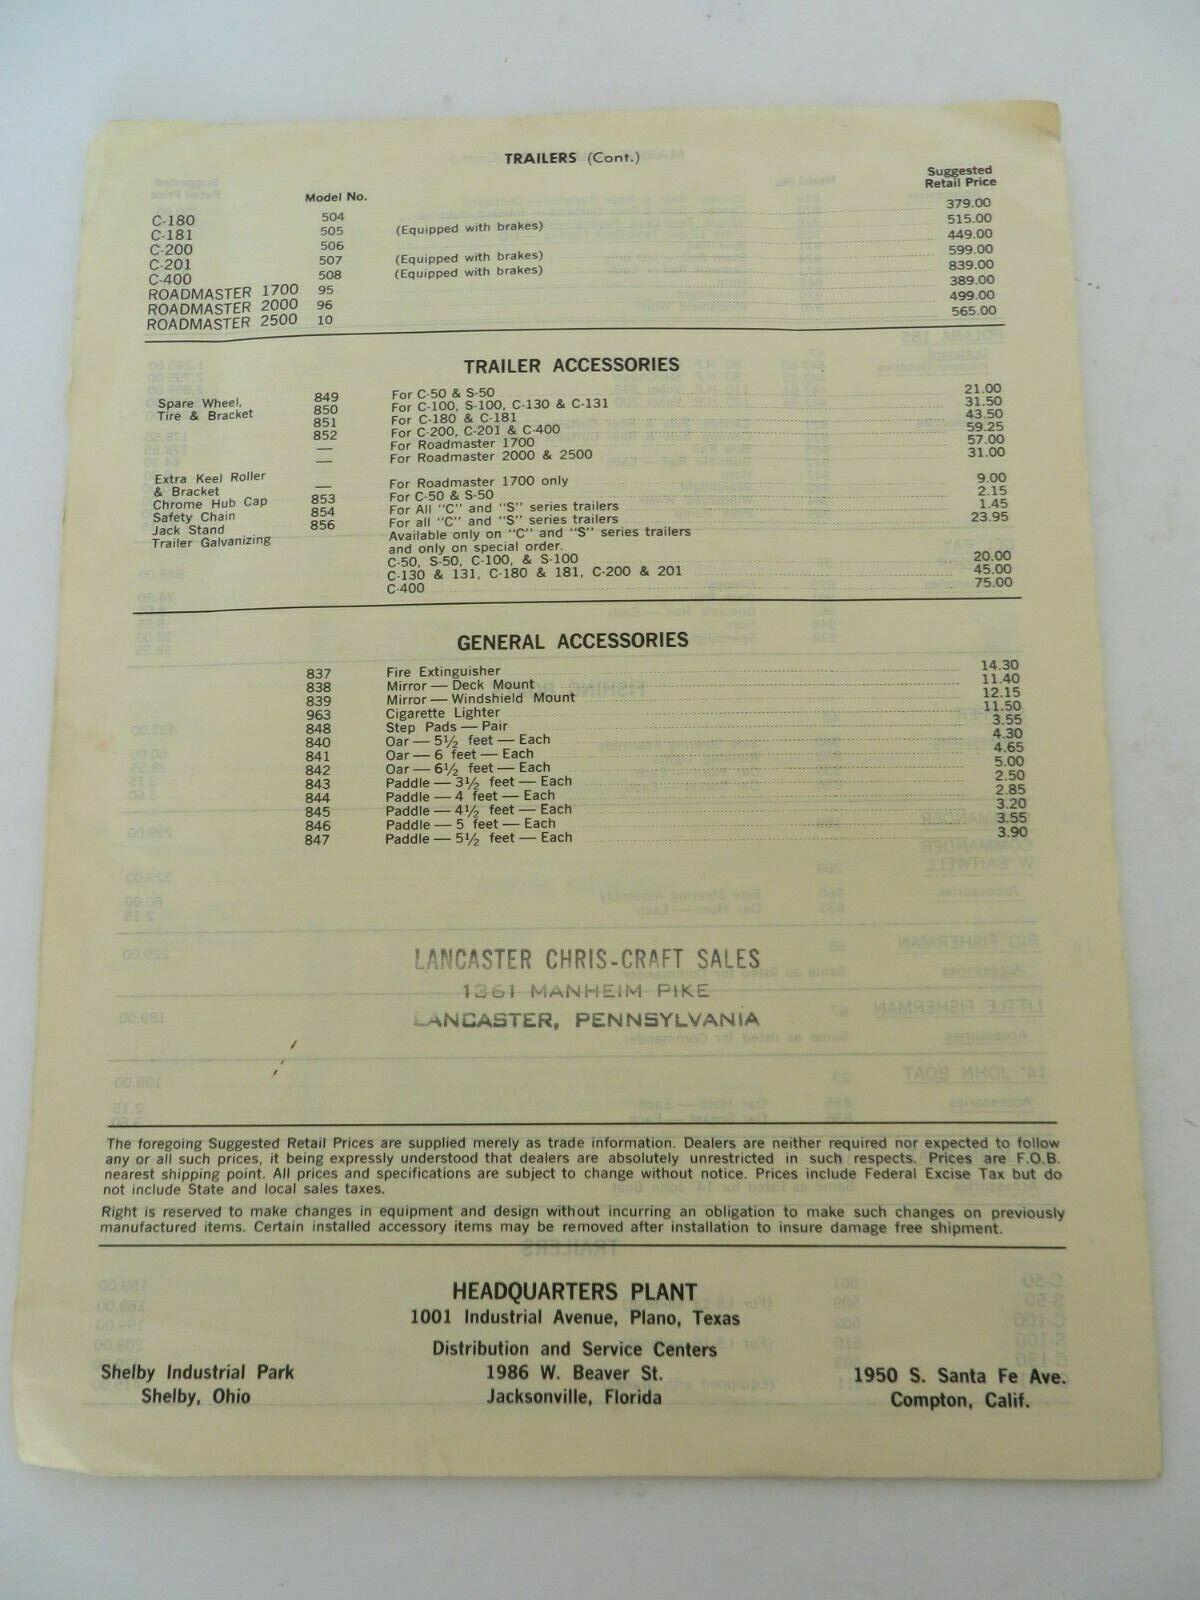 Vintage 1966 Chrysler Boat Corporation Retail Price List Fiberglass Boats 9747 - $12.96